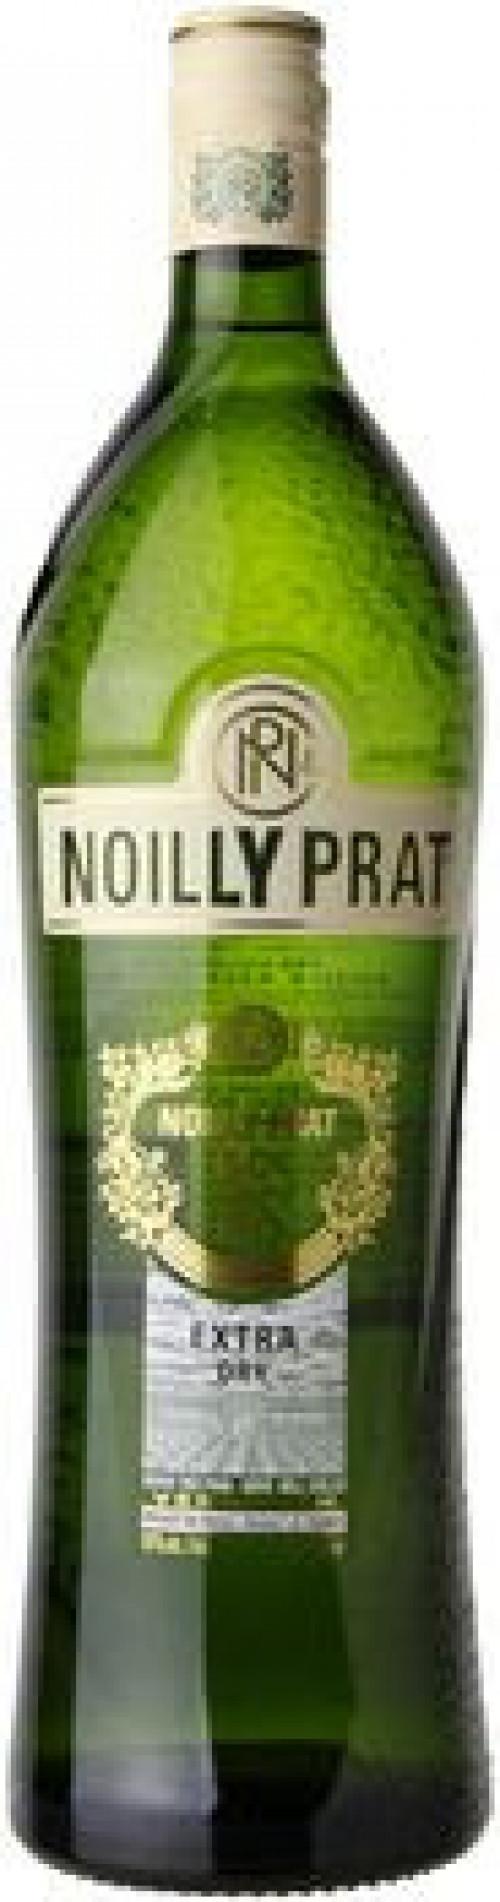 Noilly Prat Extra Dry Vermouth 1L